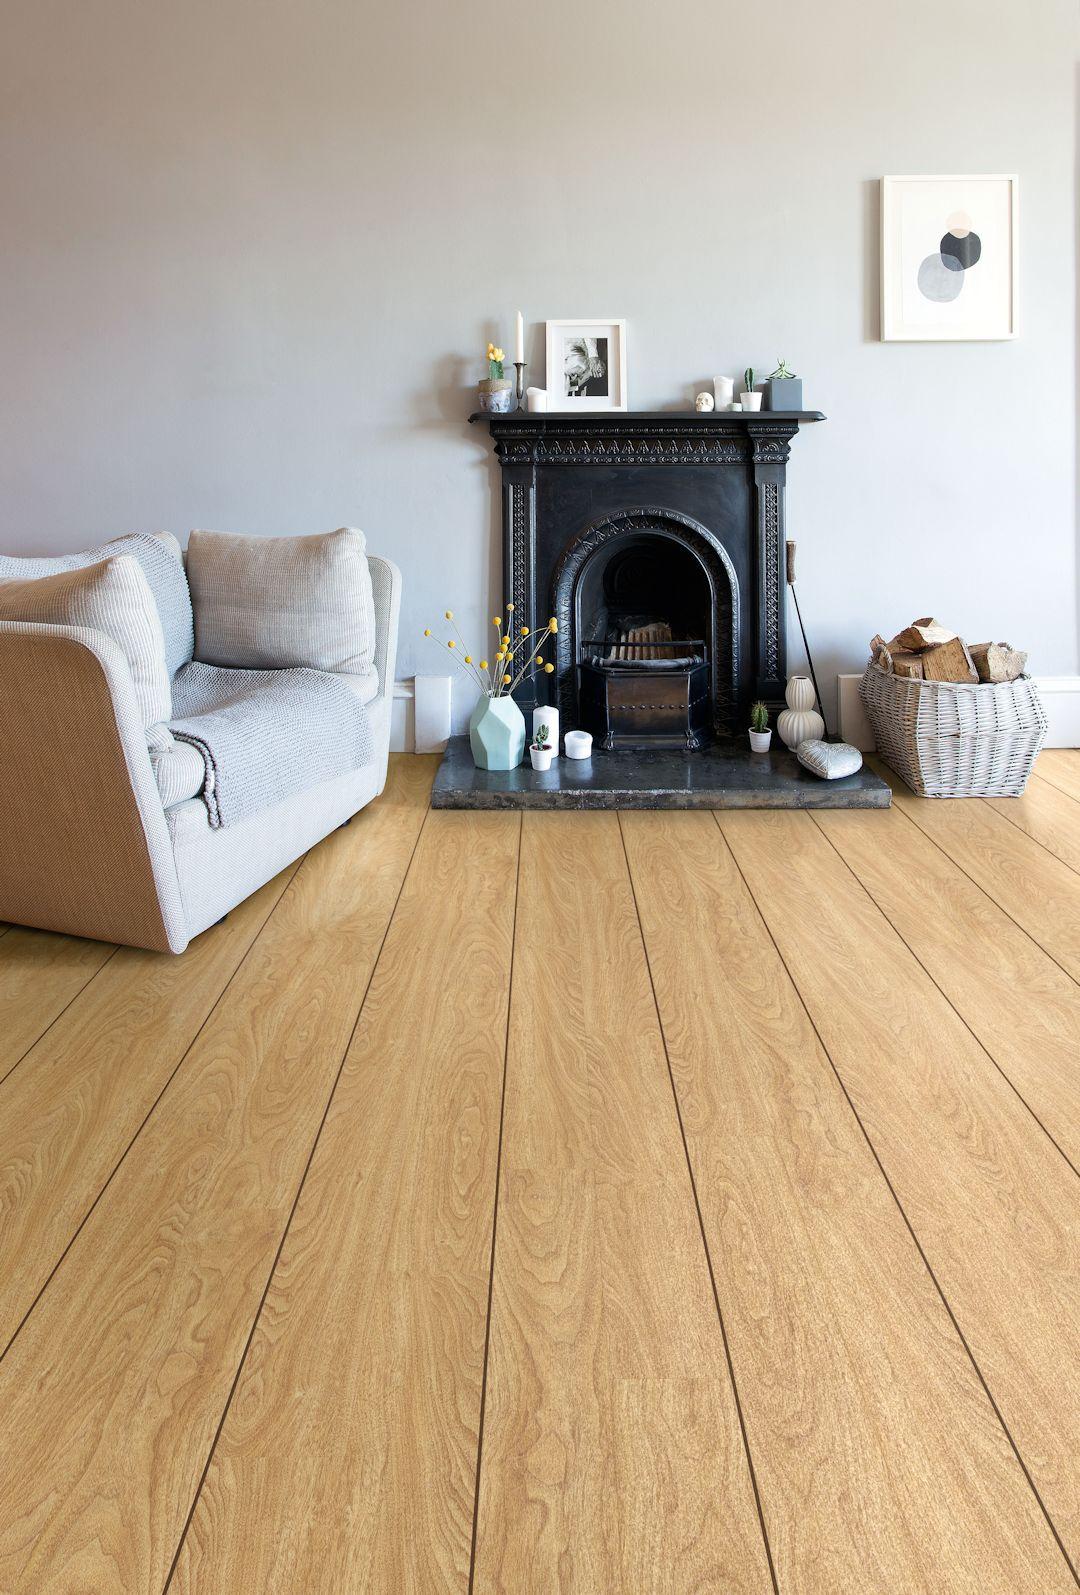 American oak camaro luxury vinyl tile flooring with brown feature american oak camaro luxury vinyl tile flooring with brown feature strip detail featured in living dailygadgetfo Choice Image